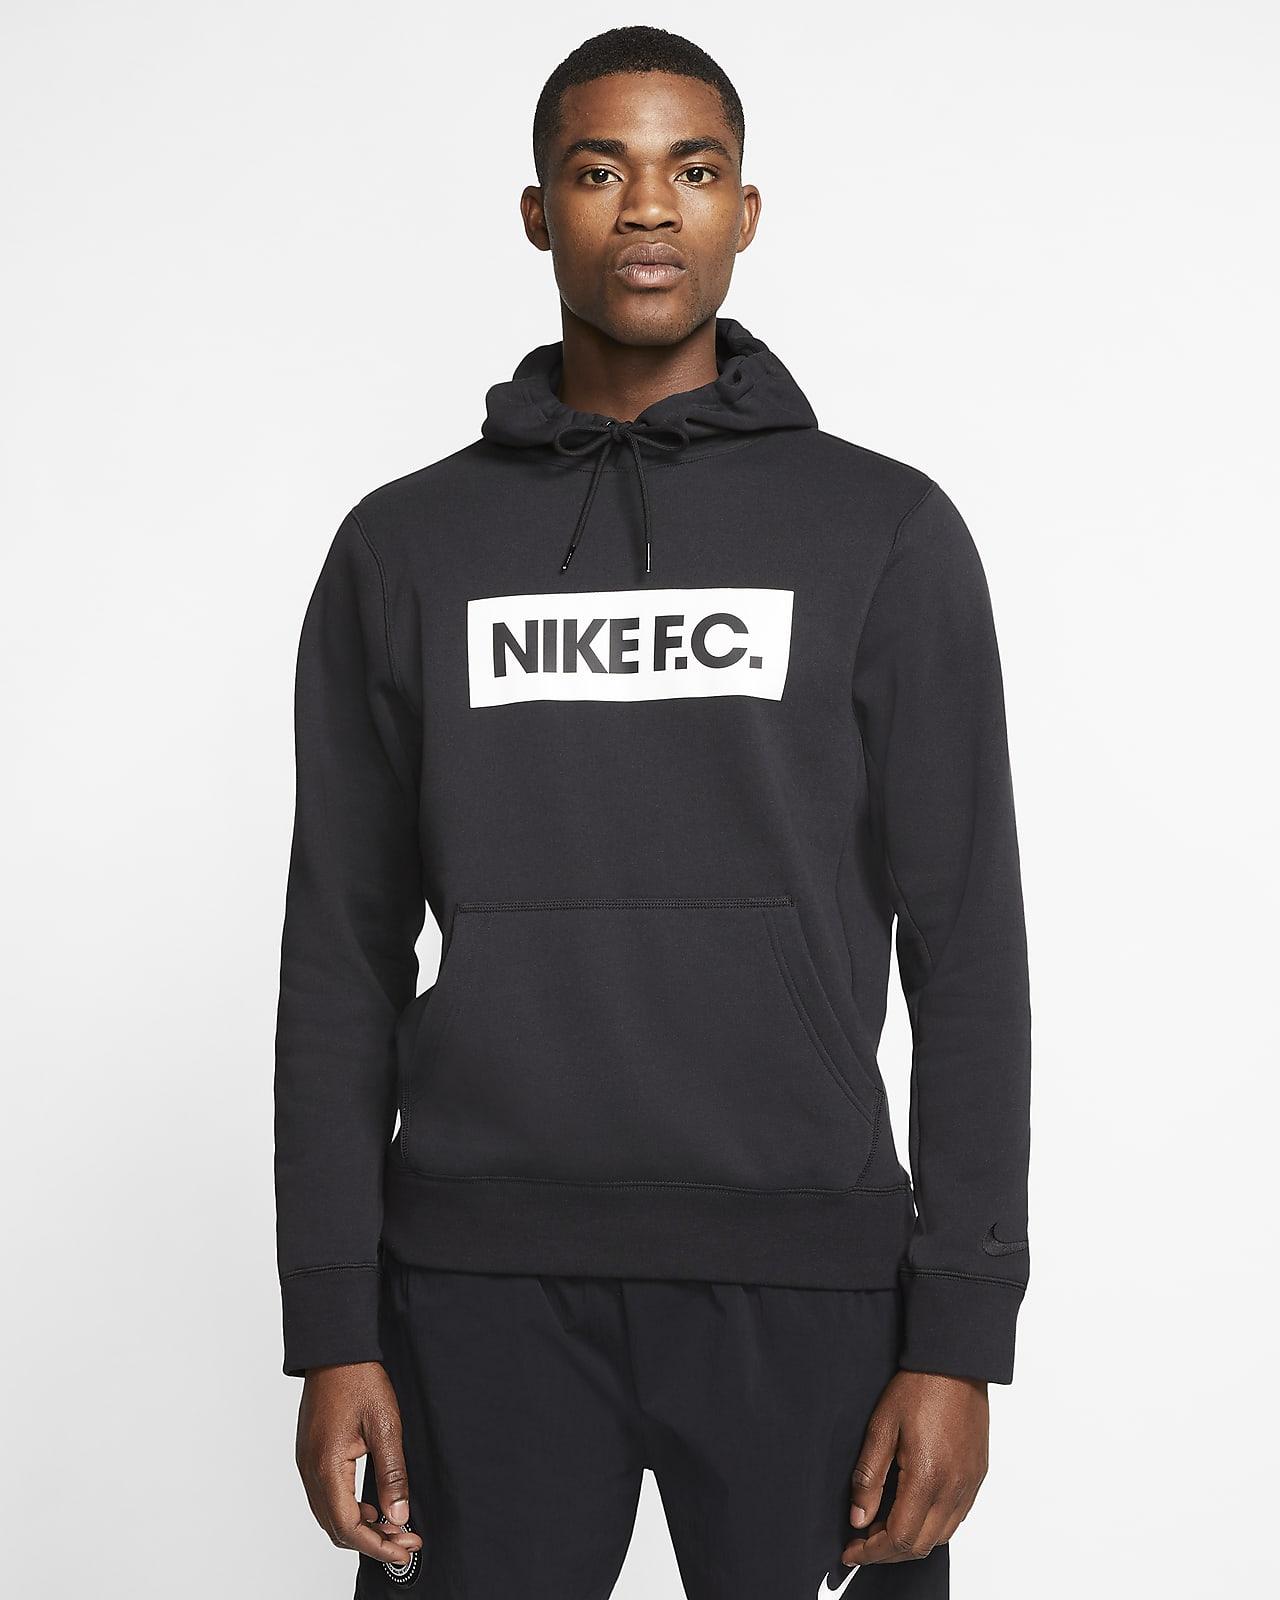 Męska piłkarska bluza z kapturem z dzianiny Nike F.C.